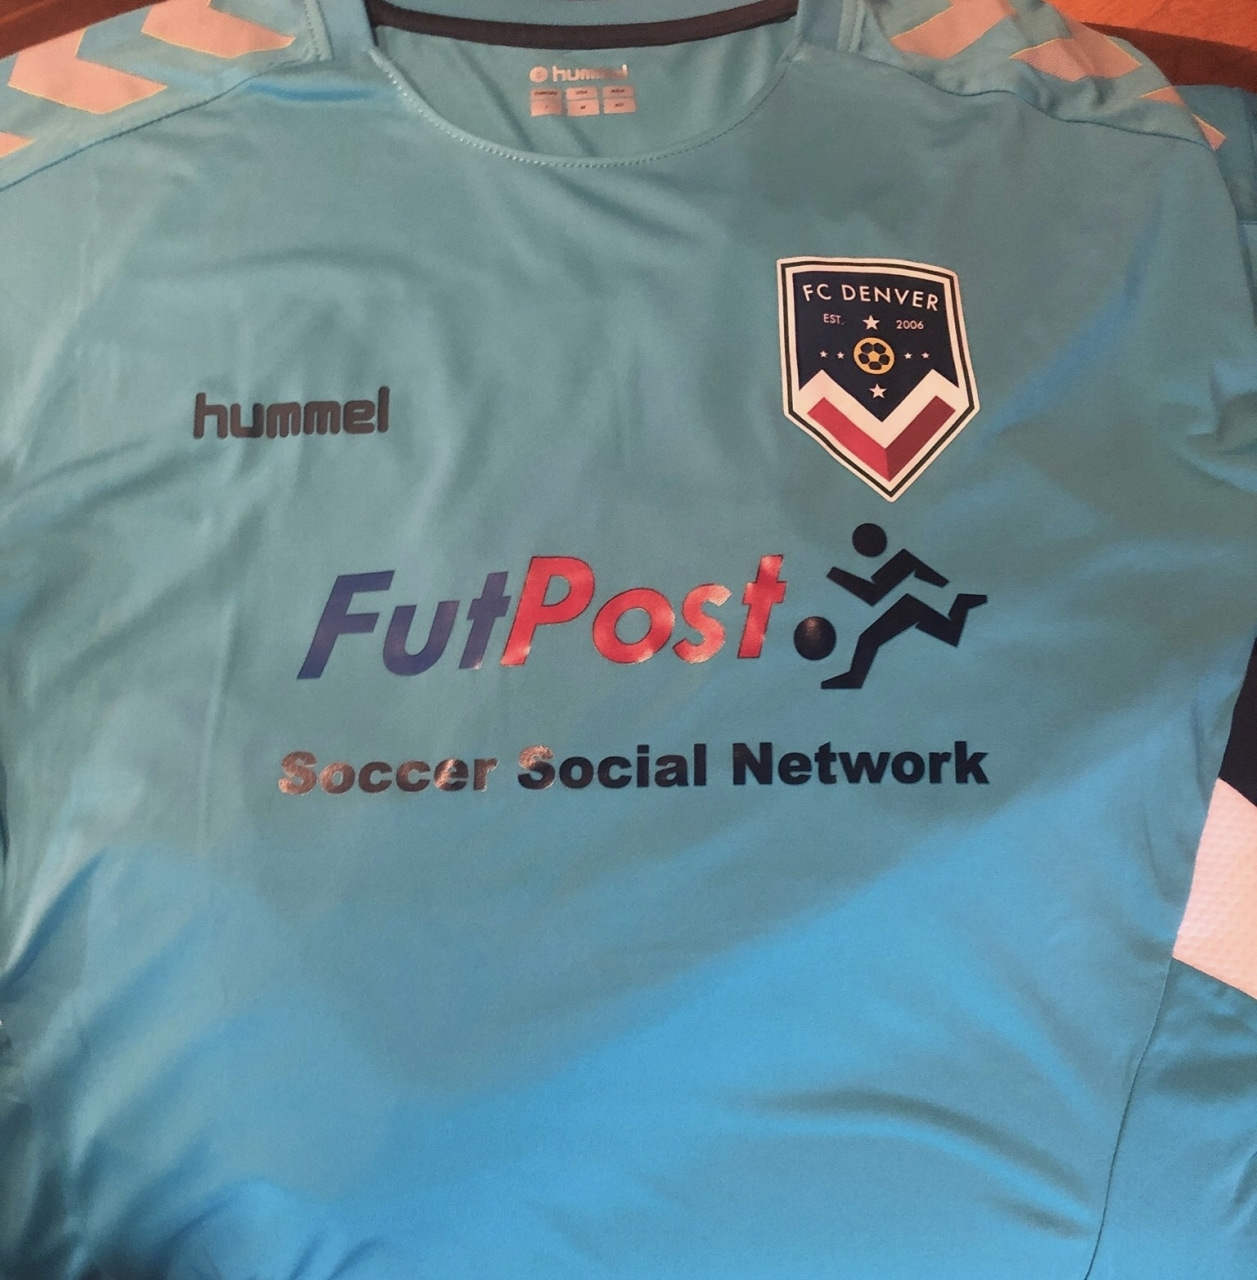 Futpost-2019 Kit